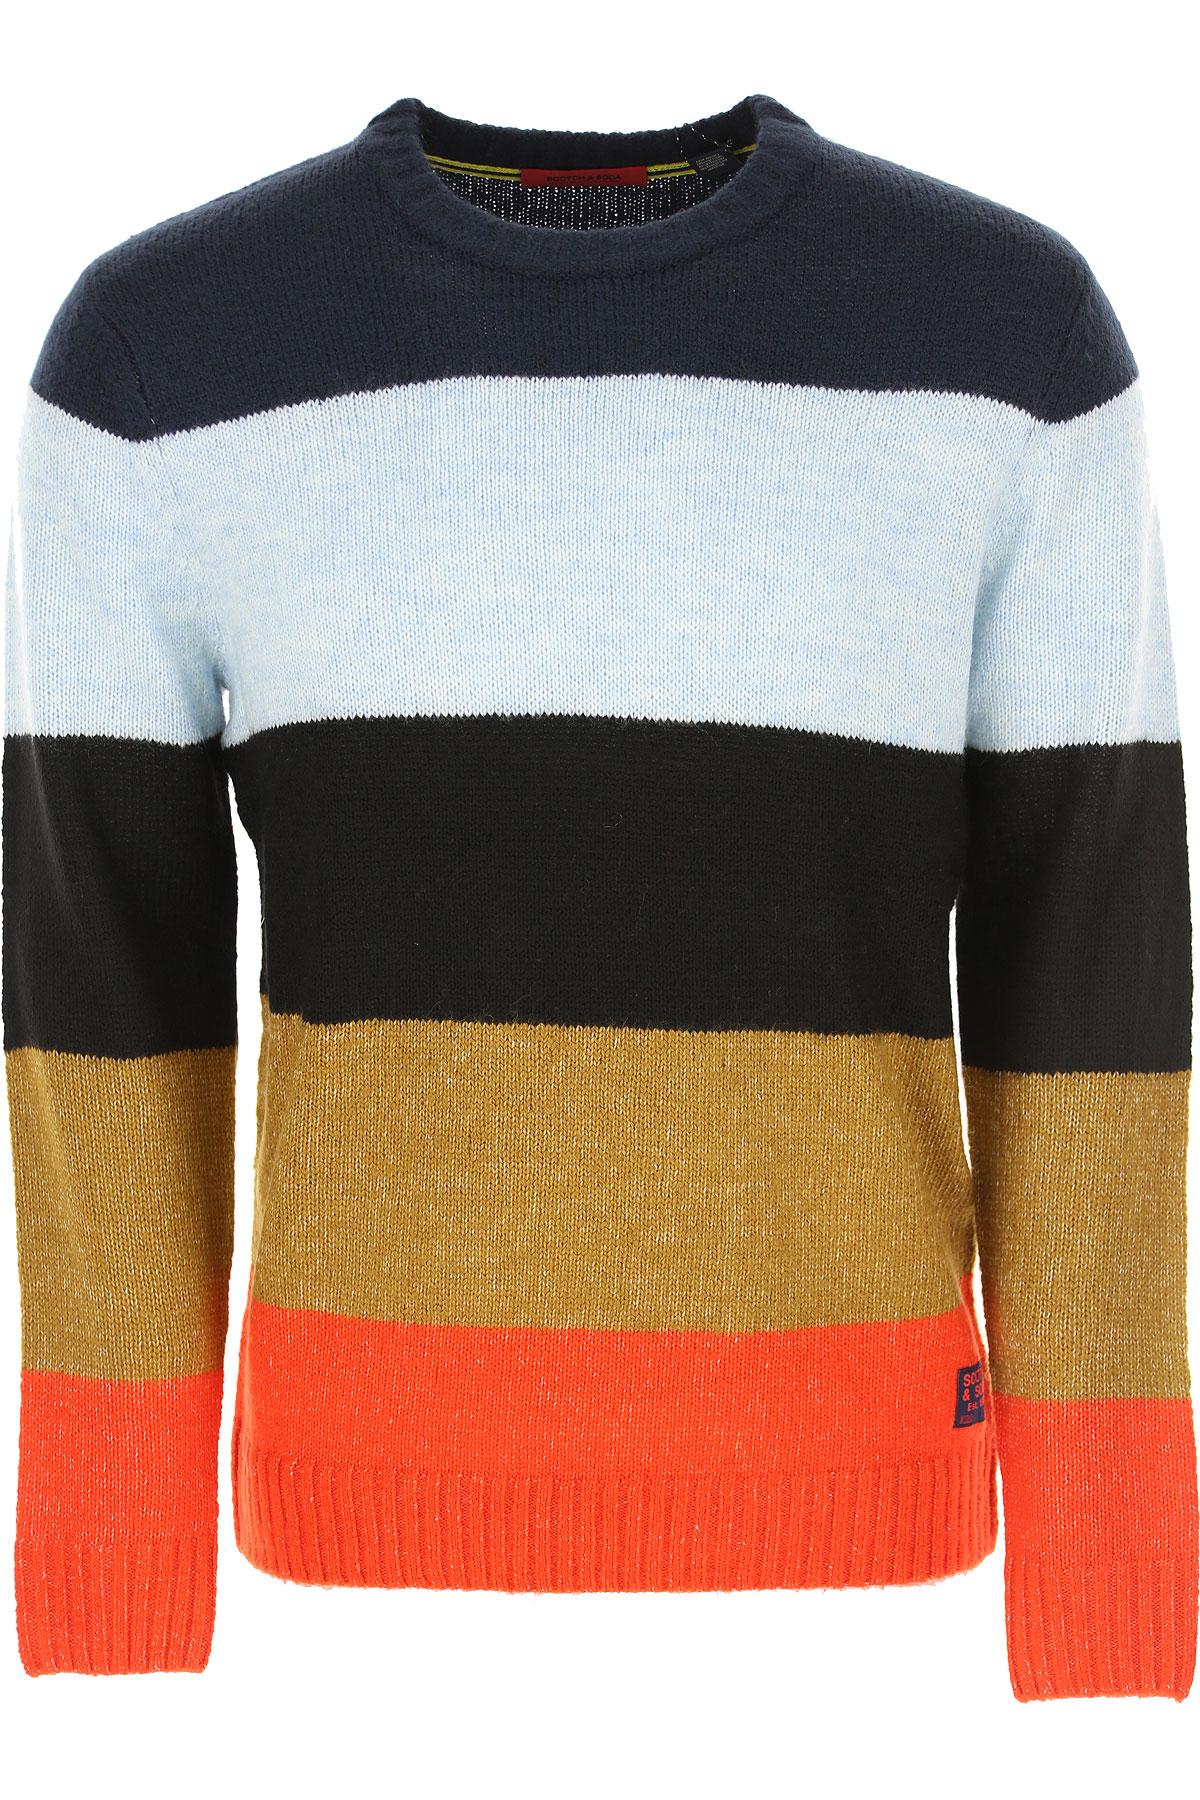 Scotch & Soda Sweater for Men Jumper On Sale, Dark Blue, Acrylic, 2019, M S XL